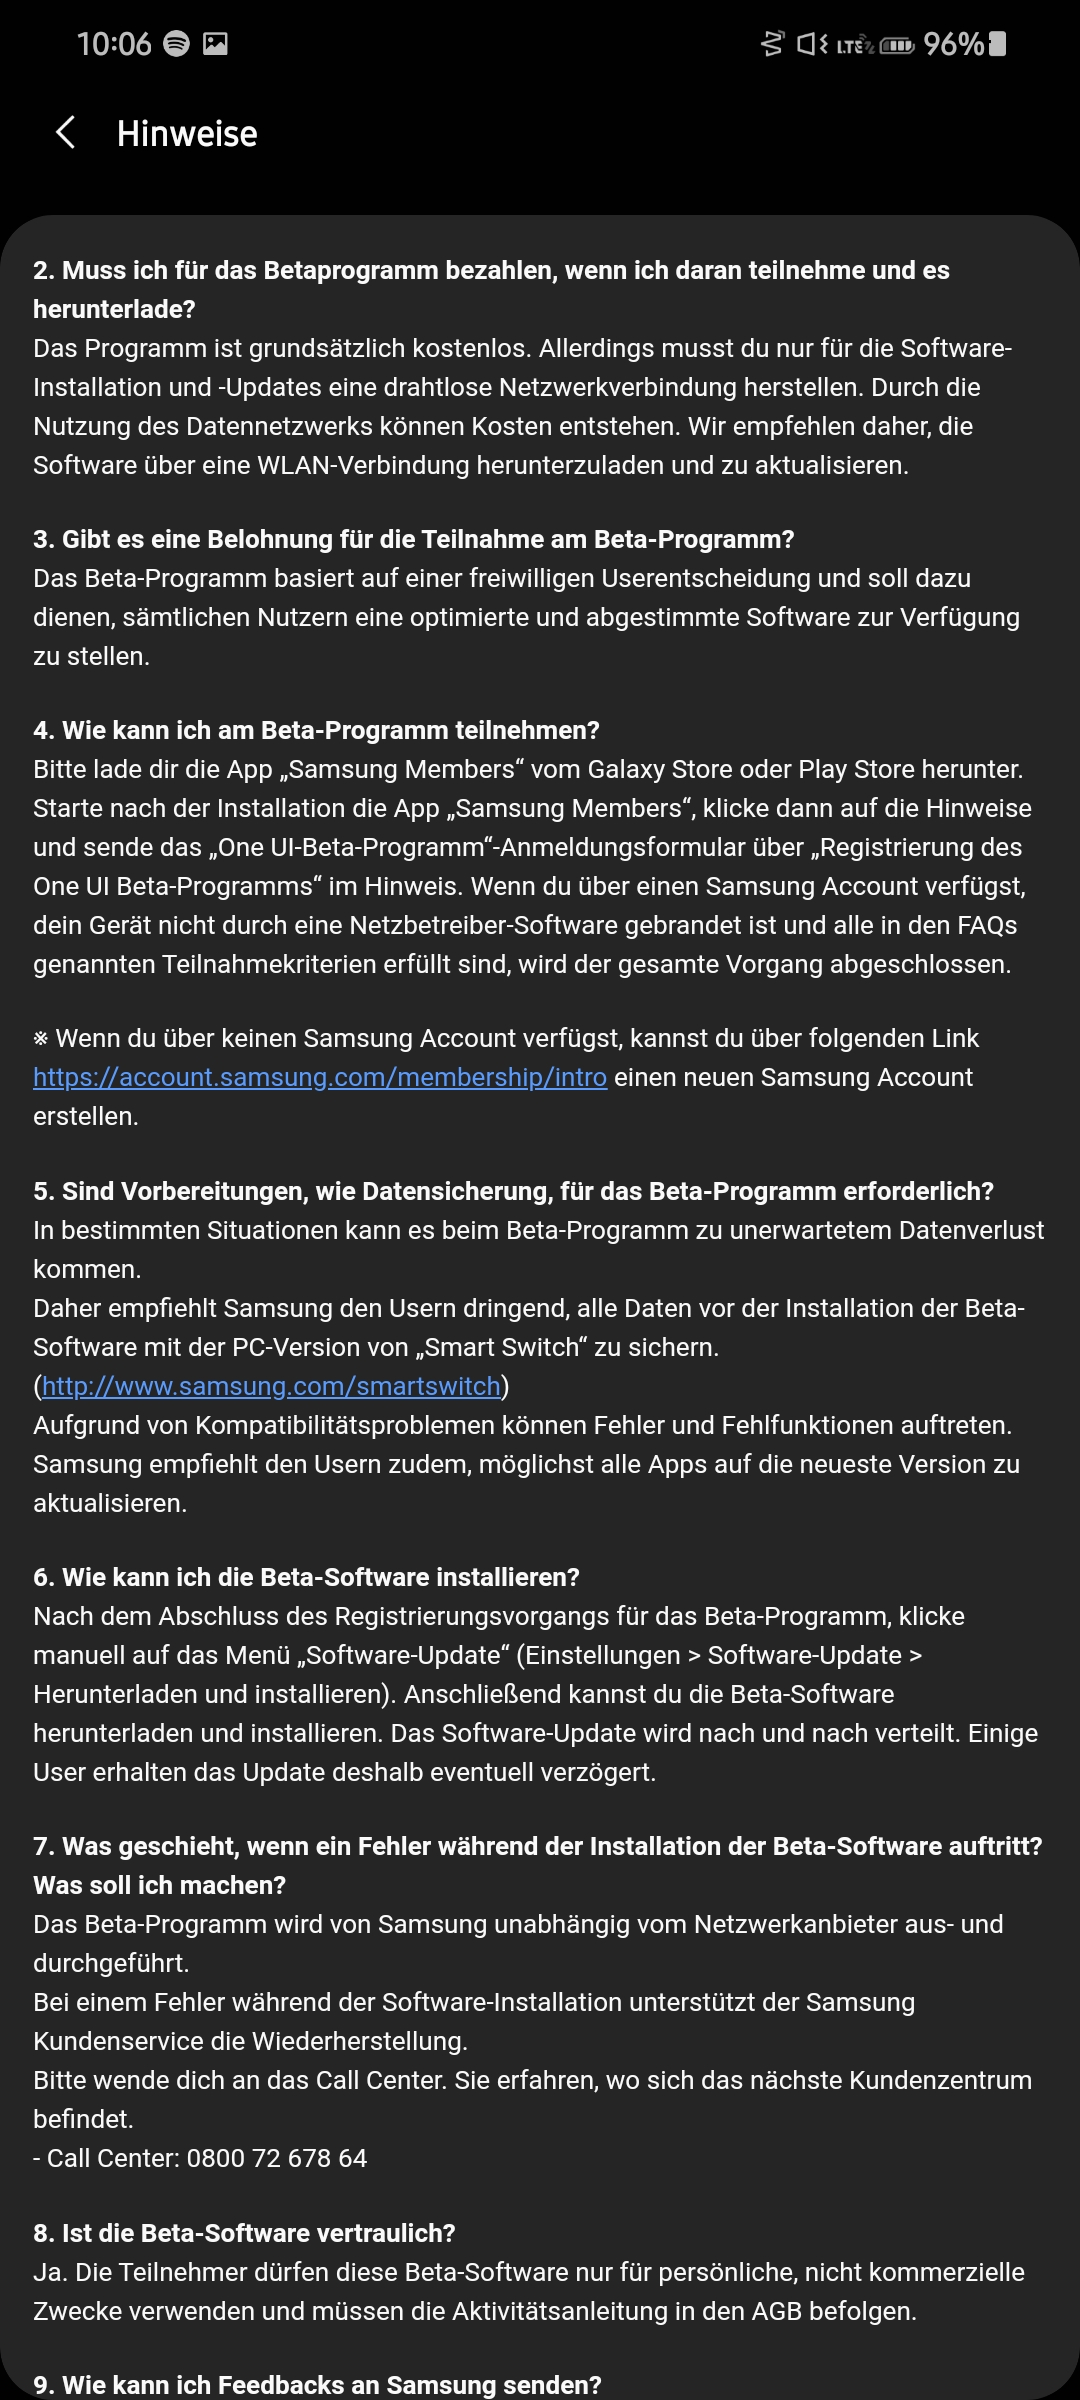 Начато открытое тестирование One UI 3 на Samsung Galaxy S20 Samsung  - samsung_nachala_otkrytoe_testirovanie_one_ui_3_na_galaxy_s20_s_exynos_2